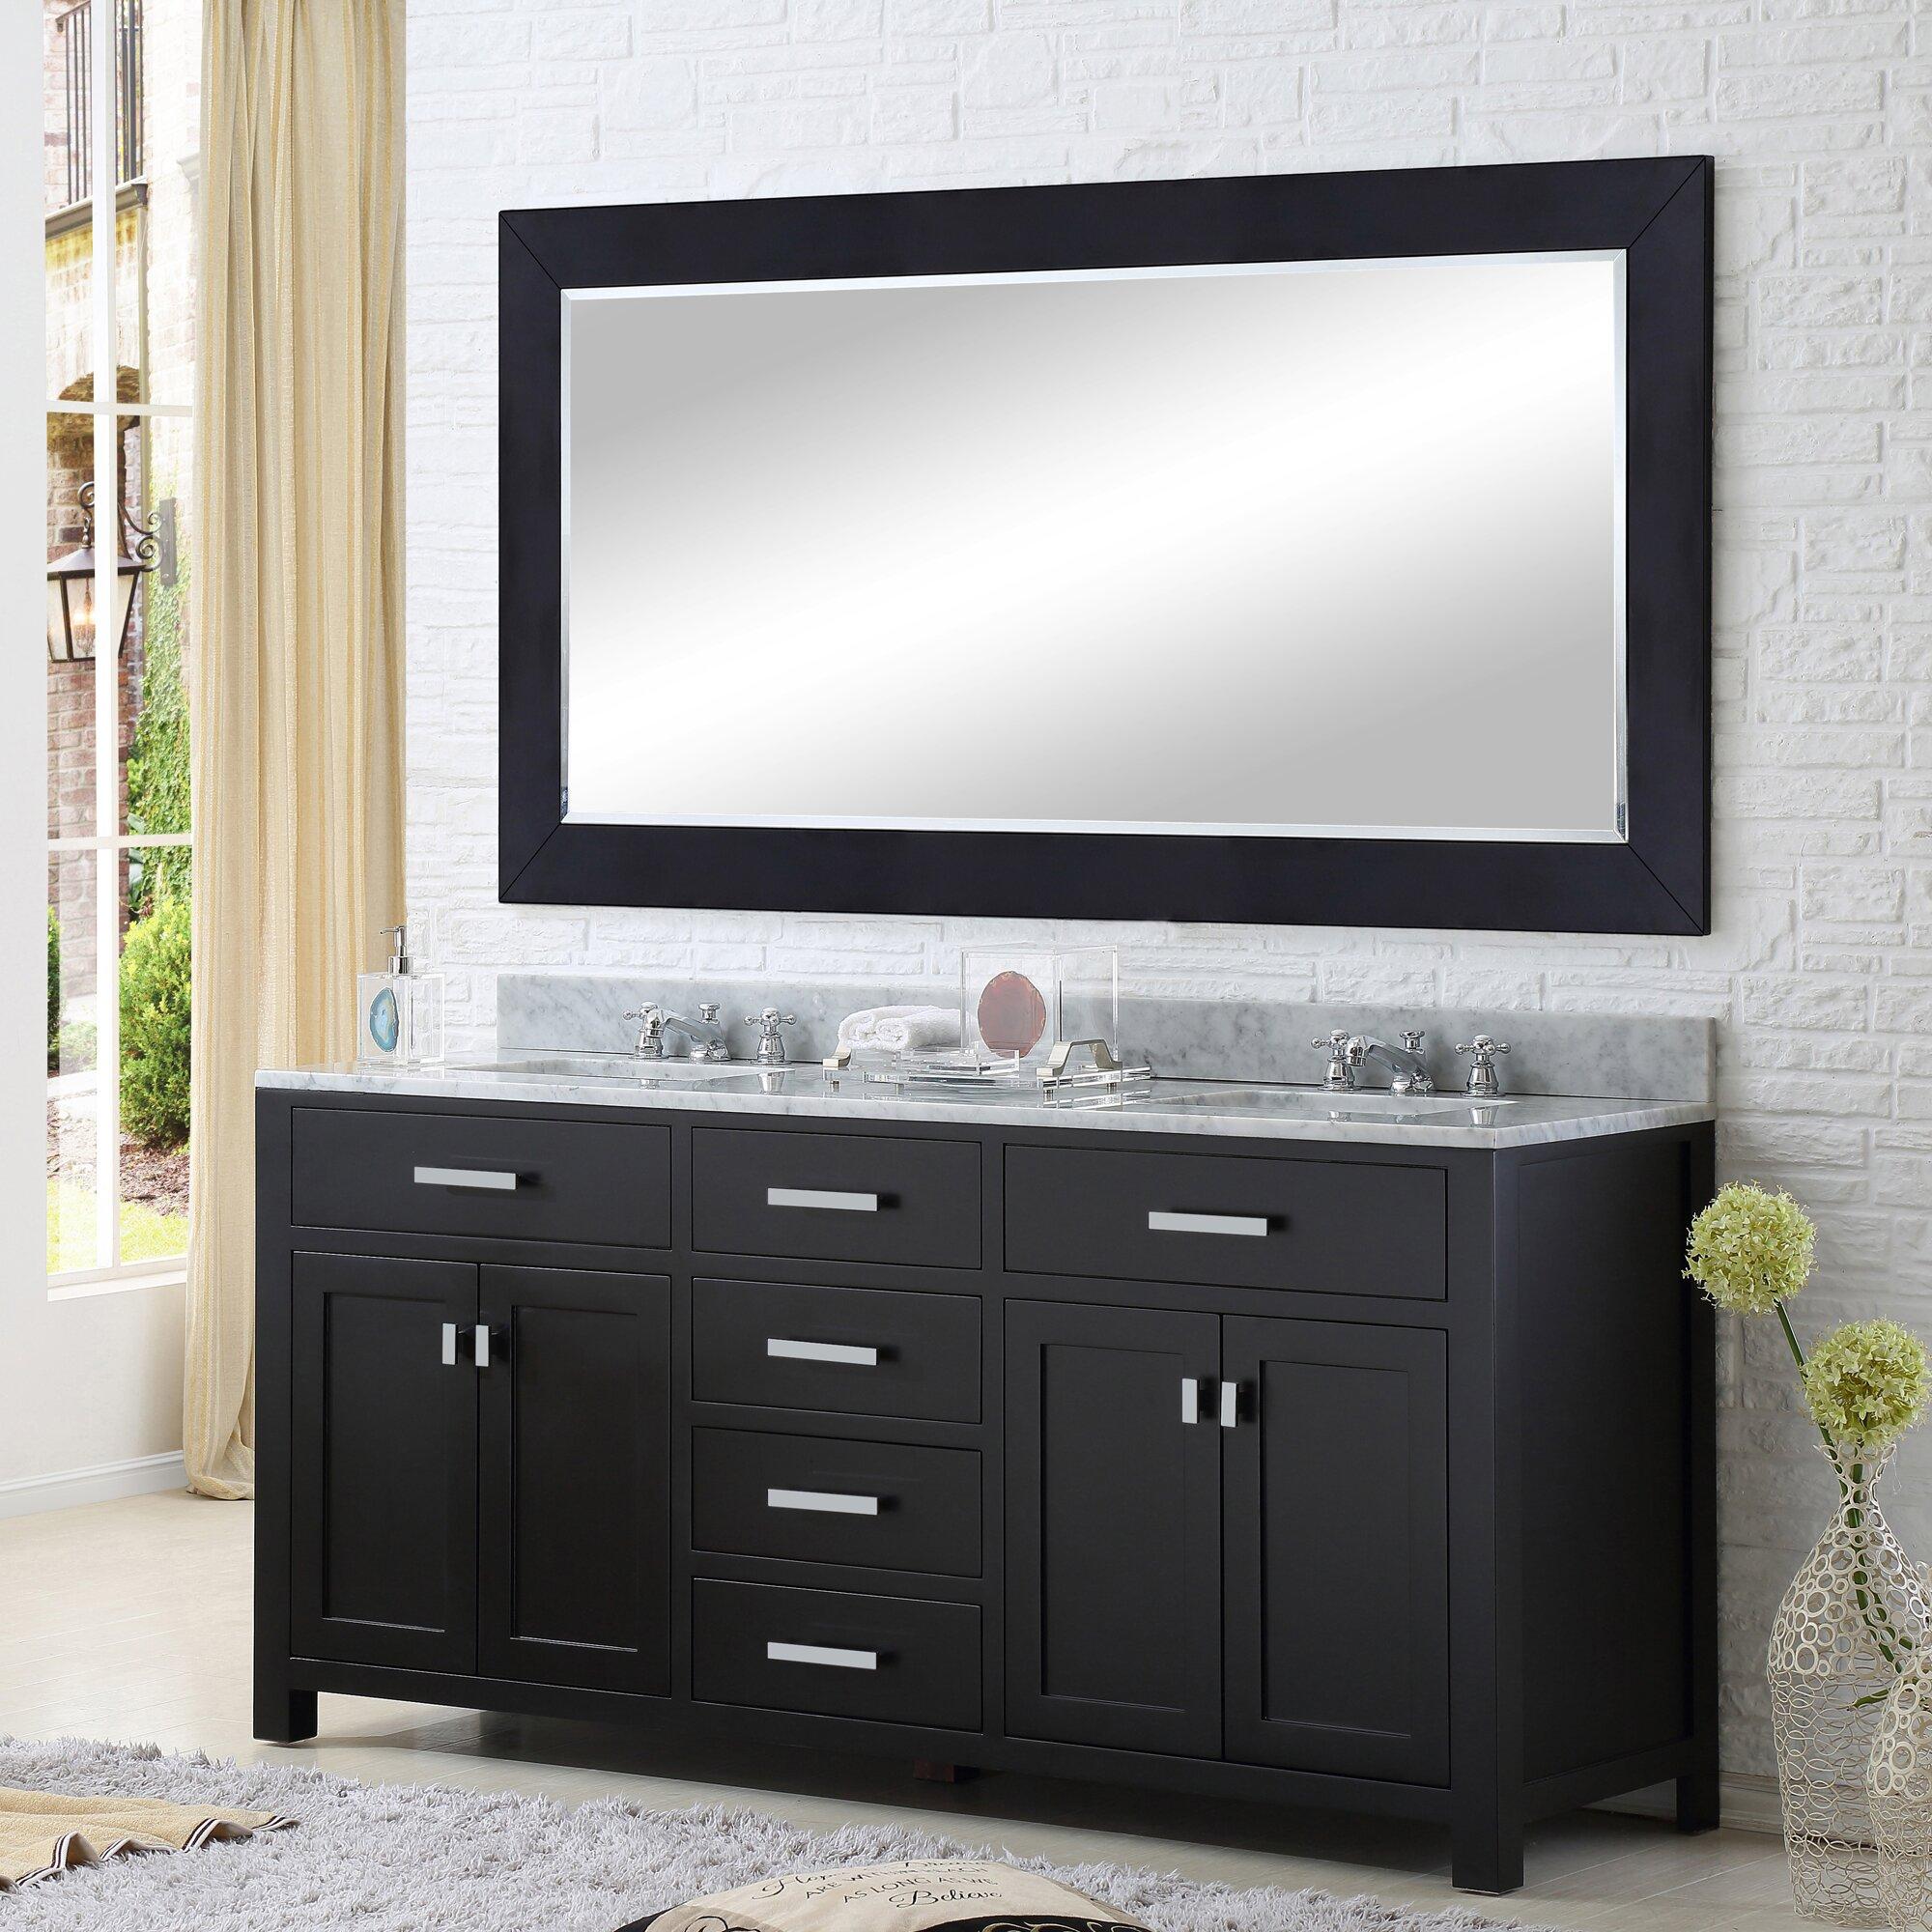 "dCOR design 60"" Double Bathroom Vanity Set with"